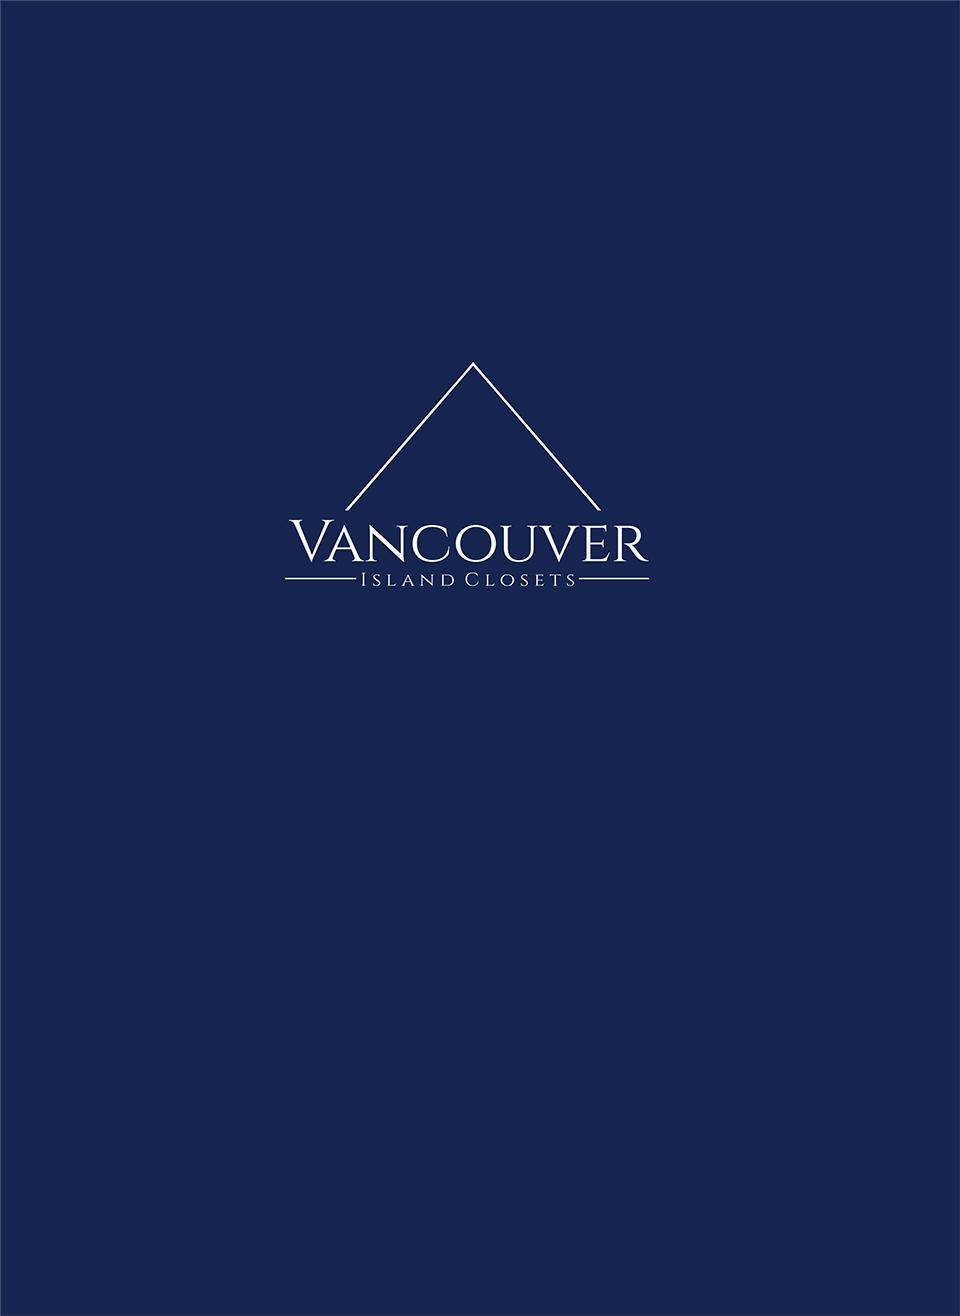 Logo Design by Private User - Entry No. 18 in the Logo Design Contest Captivating Logo Design for Vancouver Island Closets.